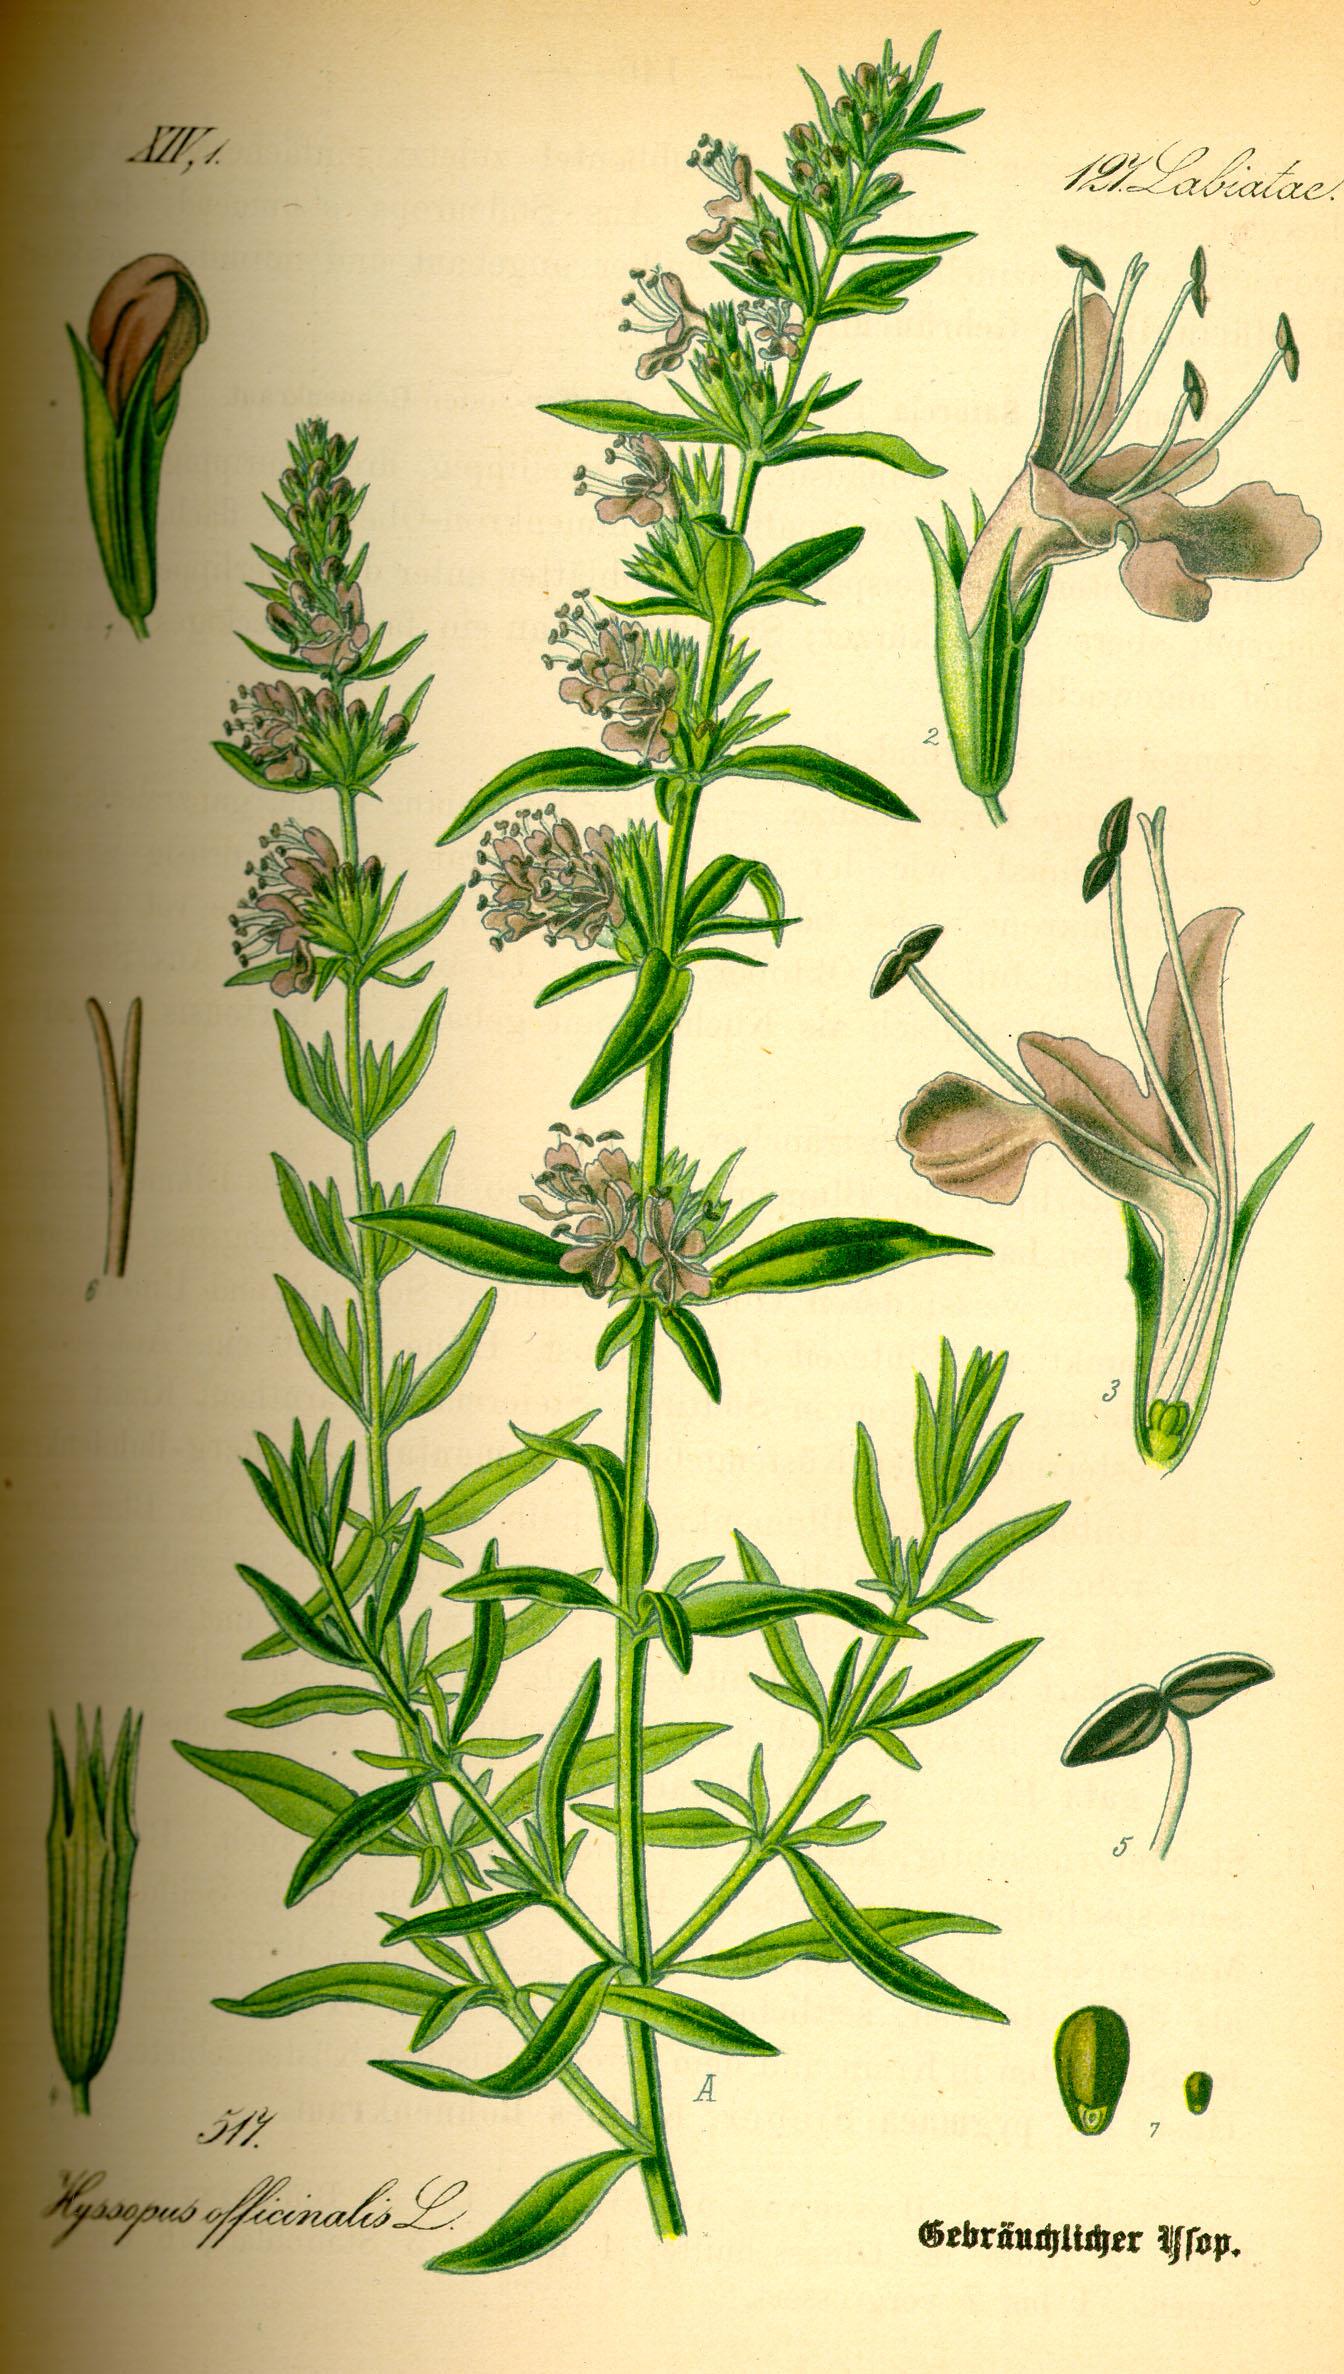 File:Illustration Hyssopus officinalis0.jpg - Wikipedia, the free ...